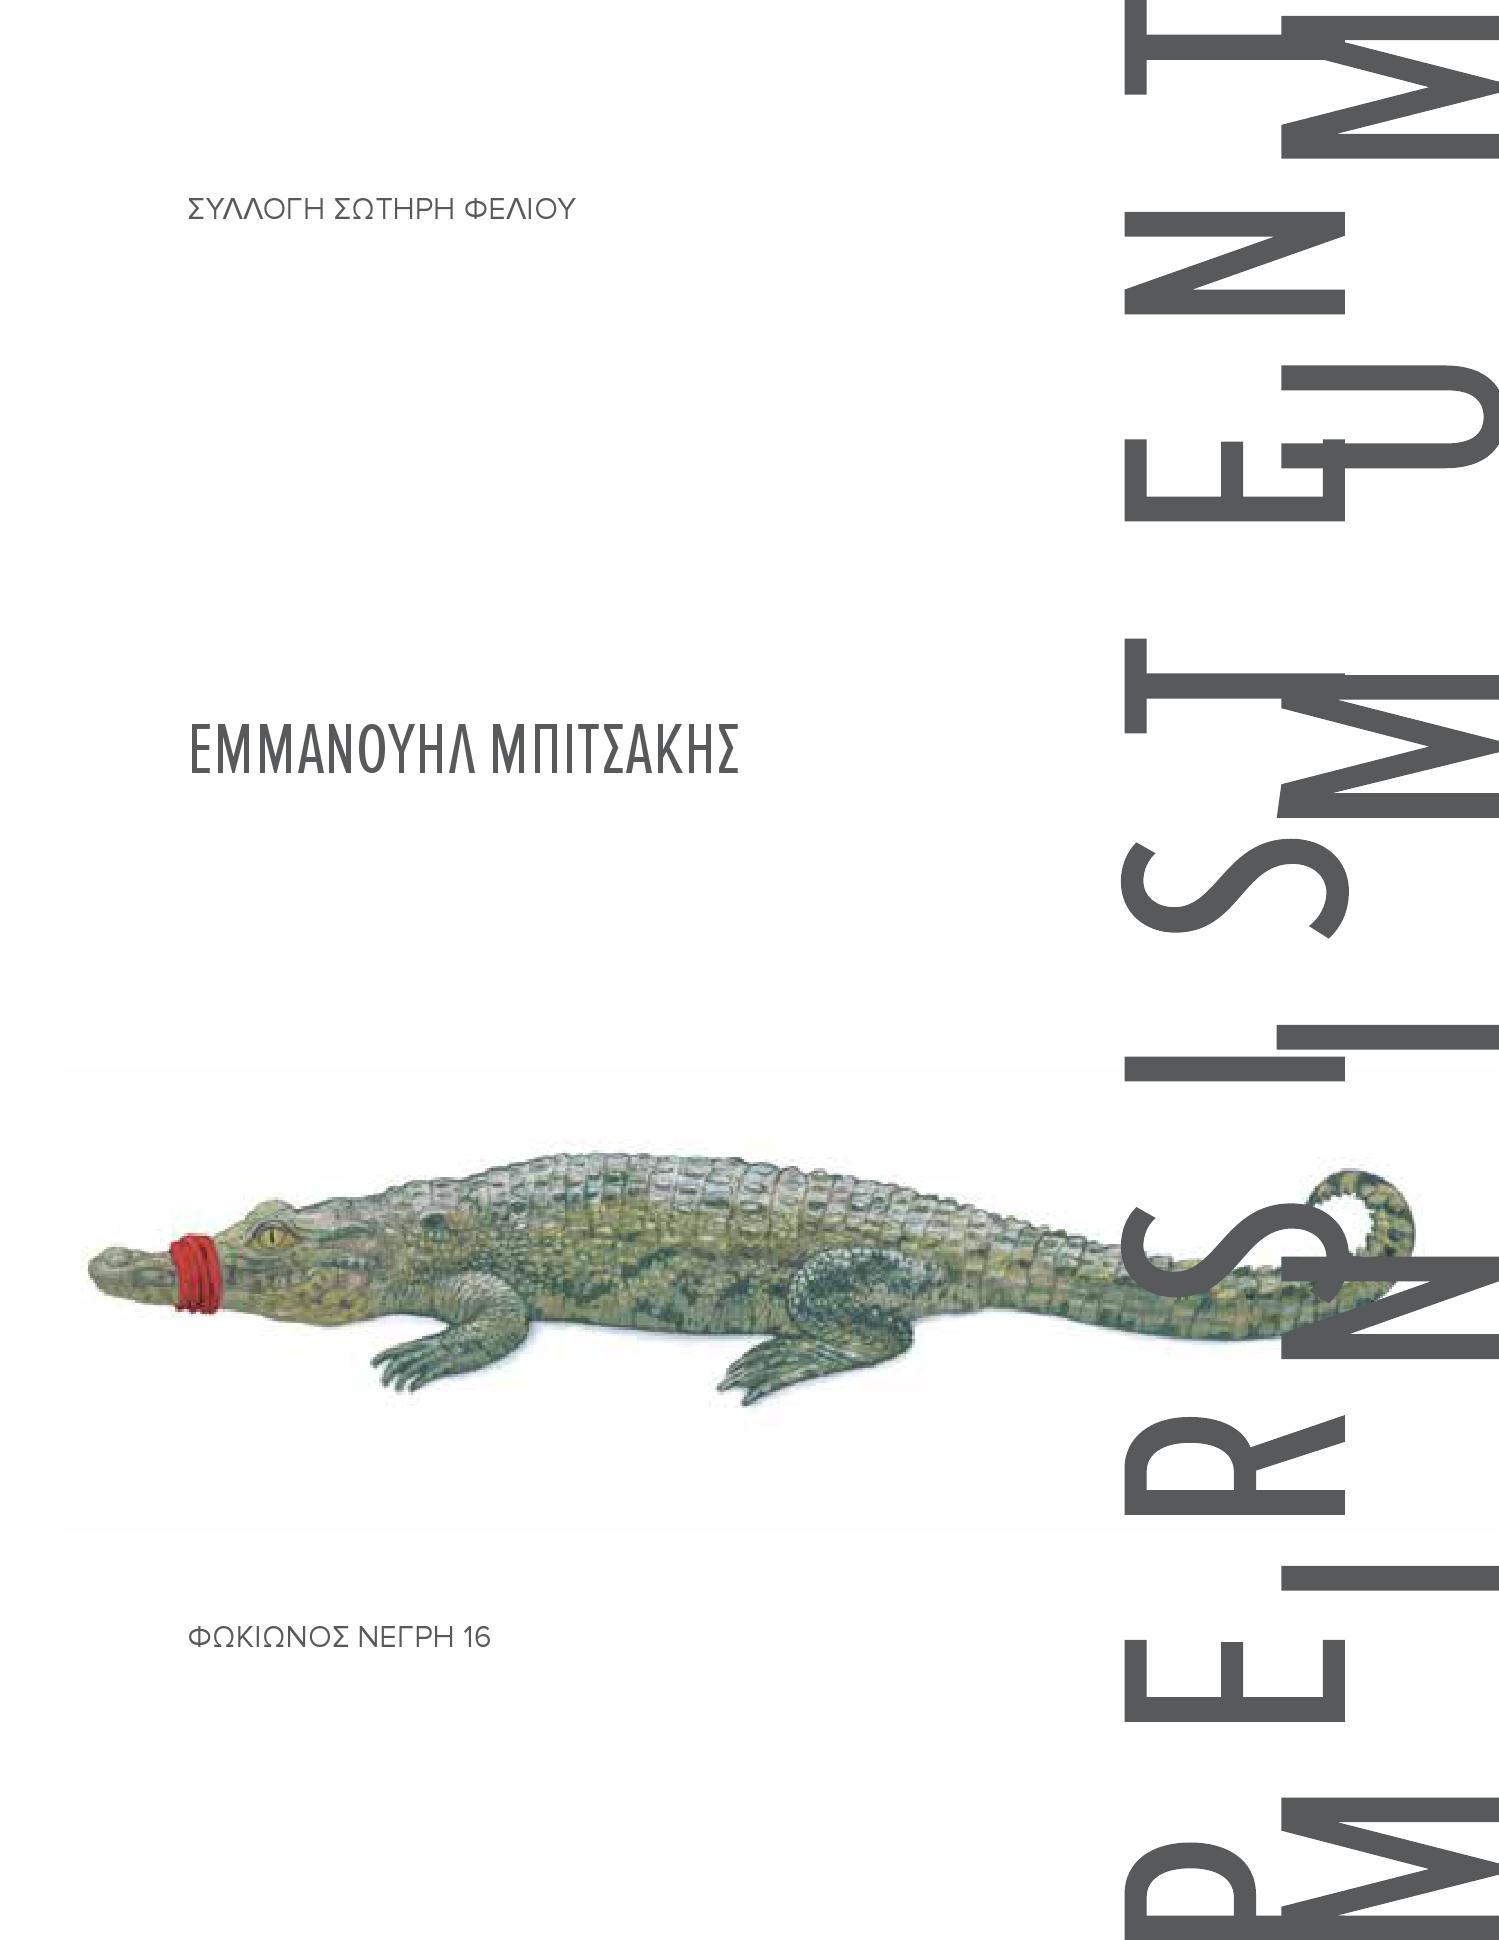 Catalogue:Συλλογή Σωτήρη Φέλιου. Εμμανουήλ Μπιτσάκης: Επίμονο Ελάχιστο